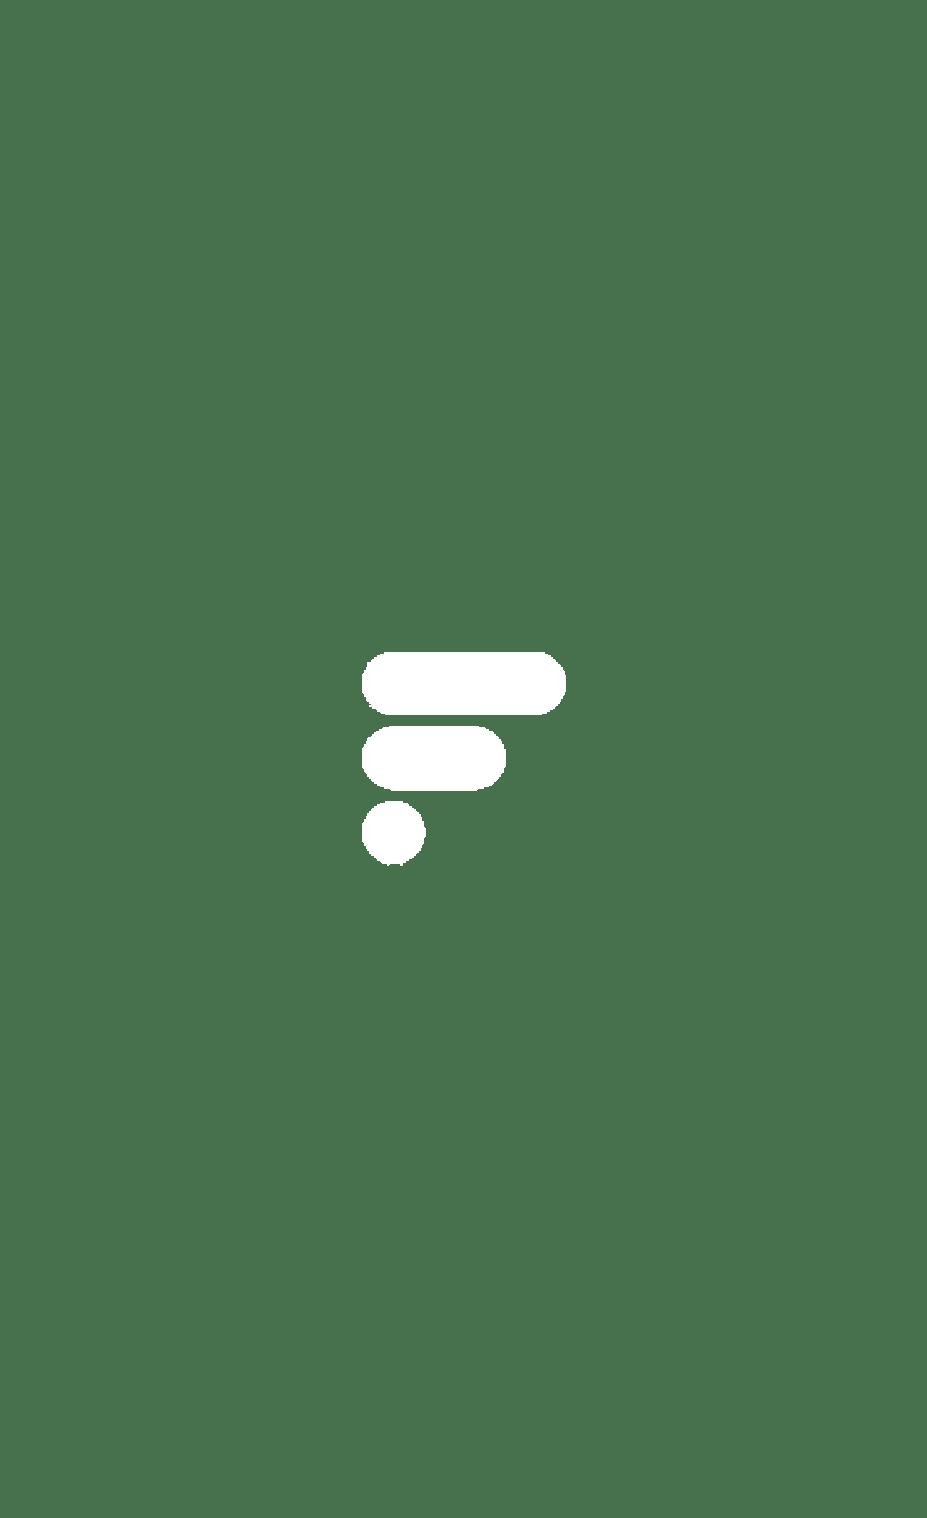 chrome emoji 1er avril